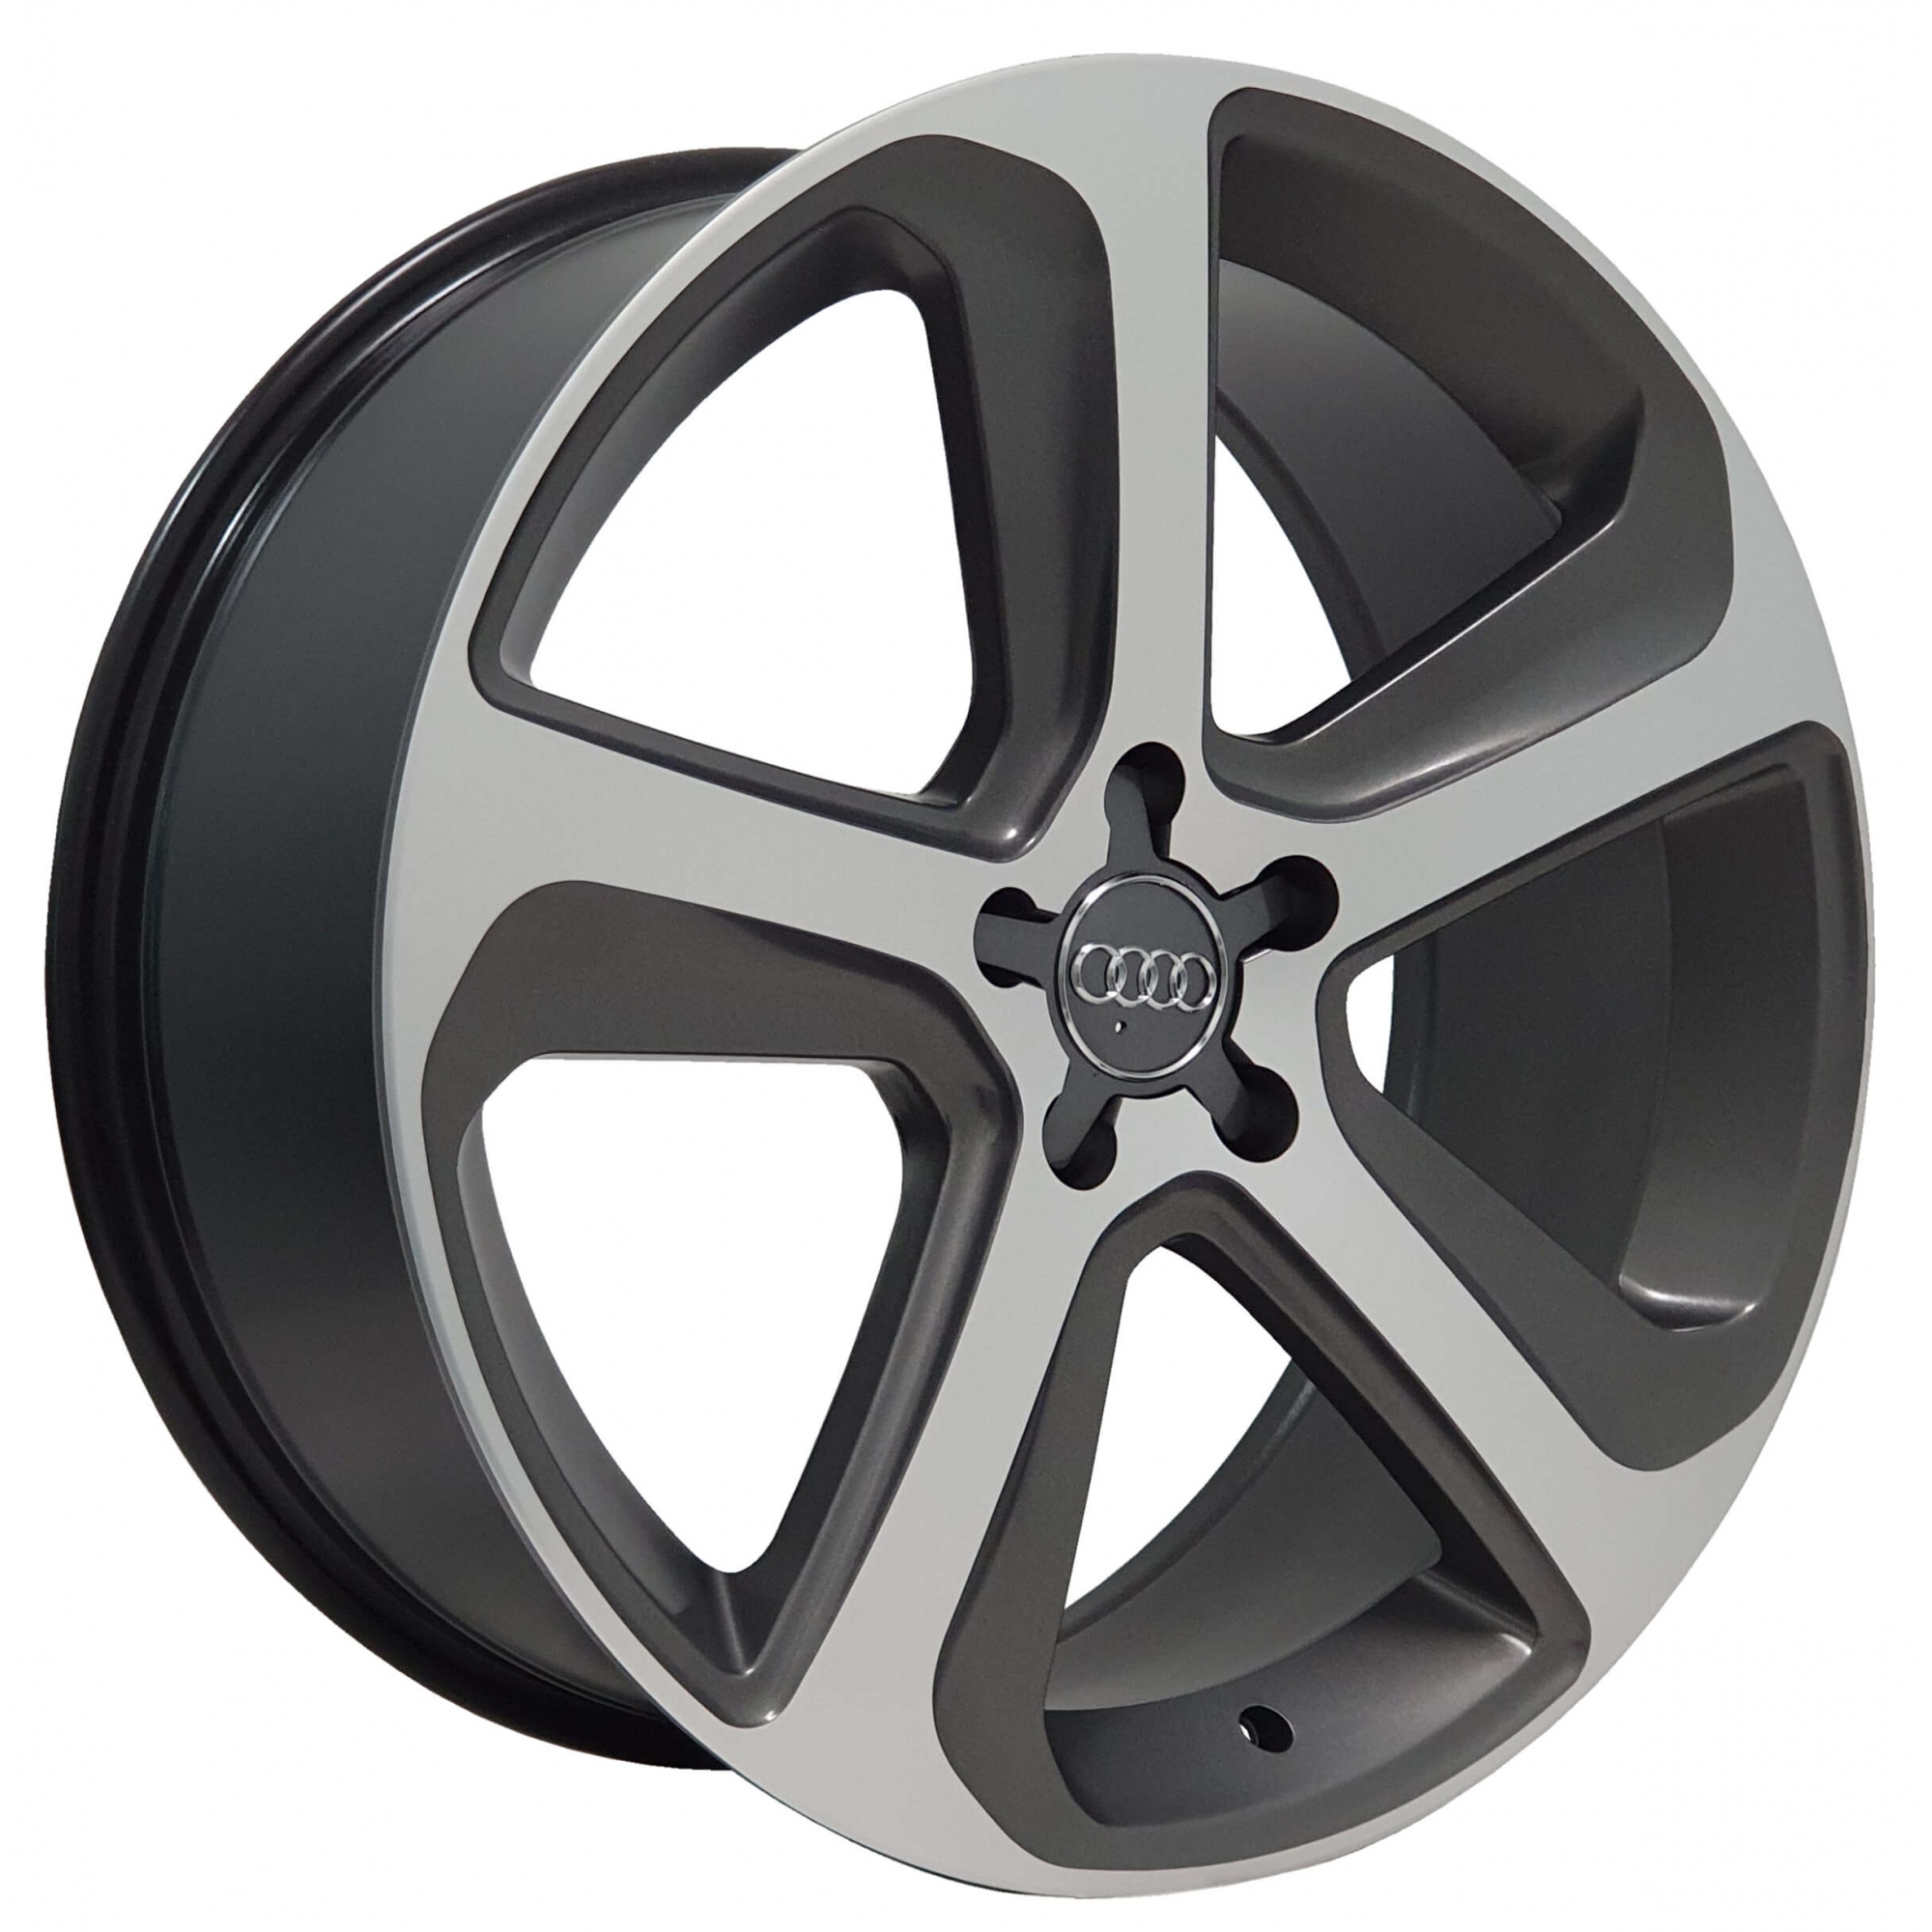 Jogo Rodas Audi Q5 Monacco MW080 Aro 17 5x100 Grafite Semi Brilho Diamantado